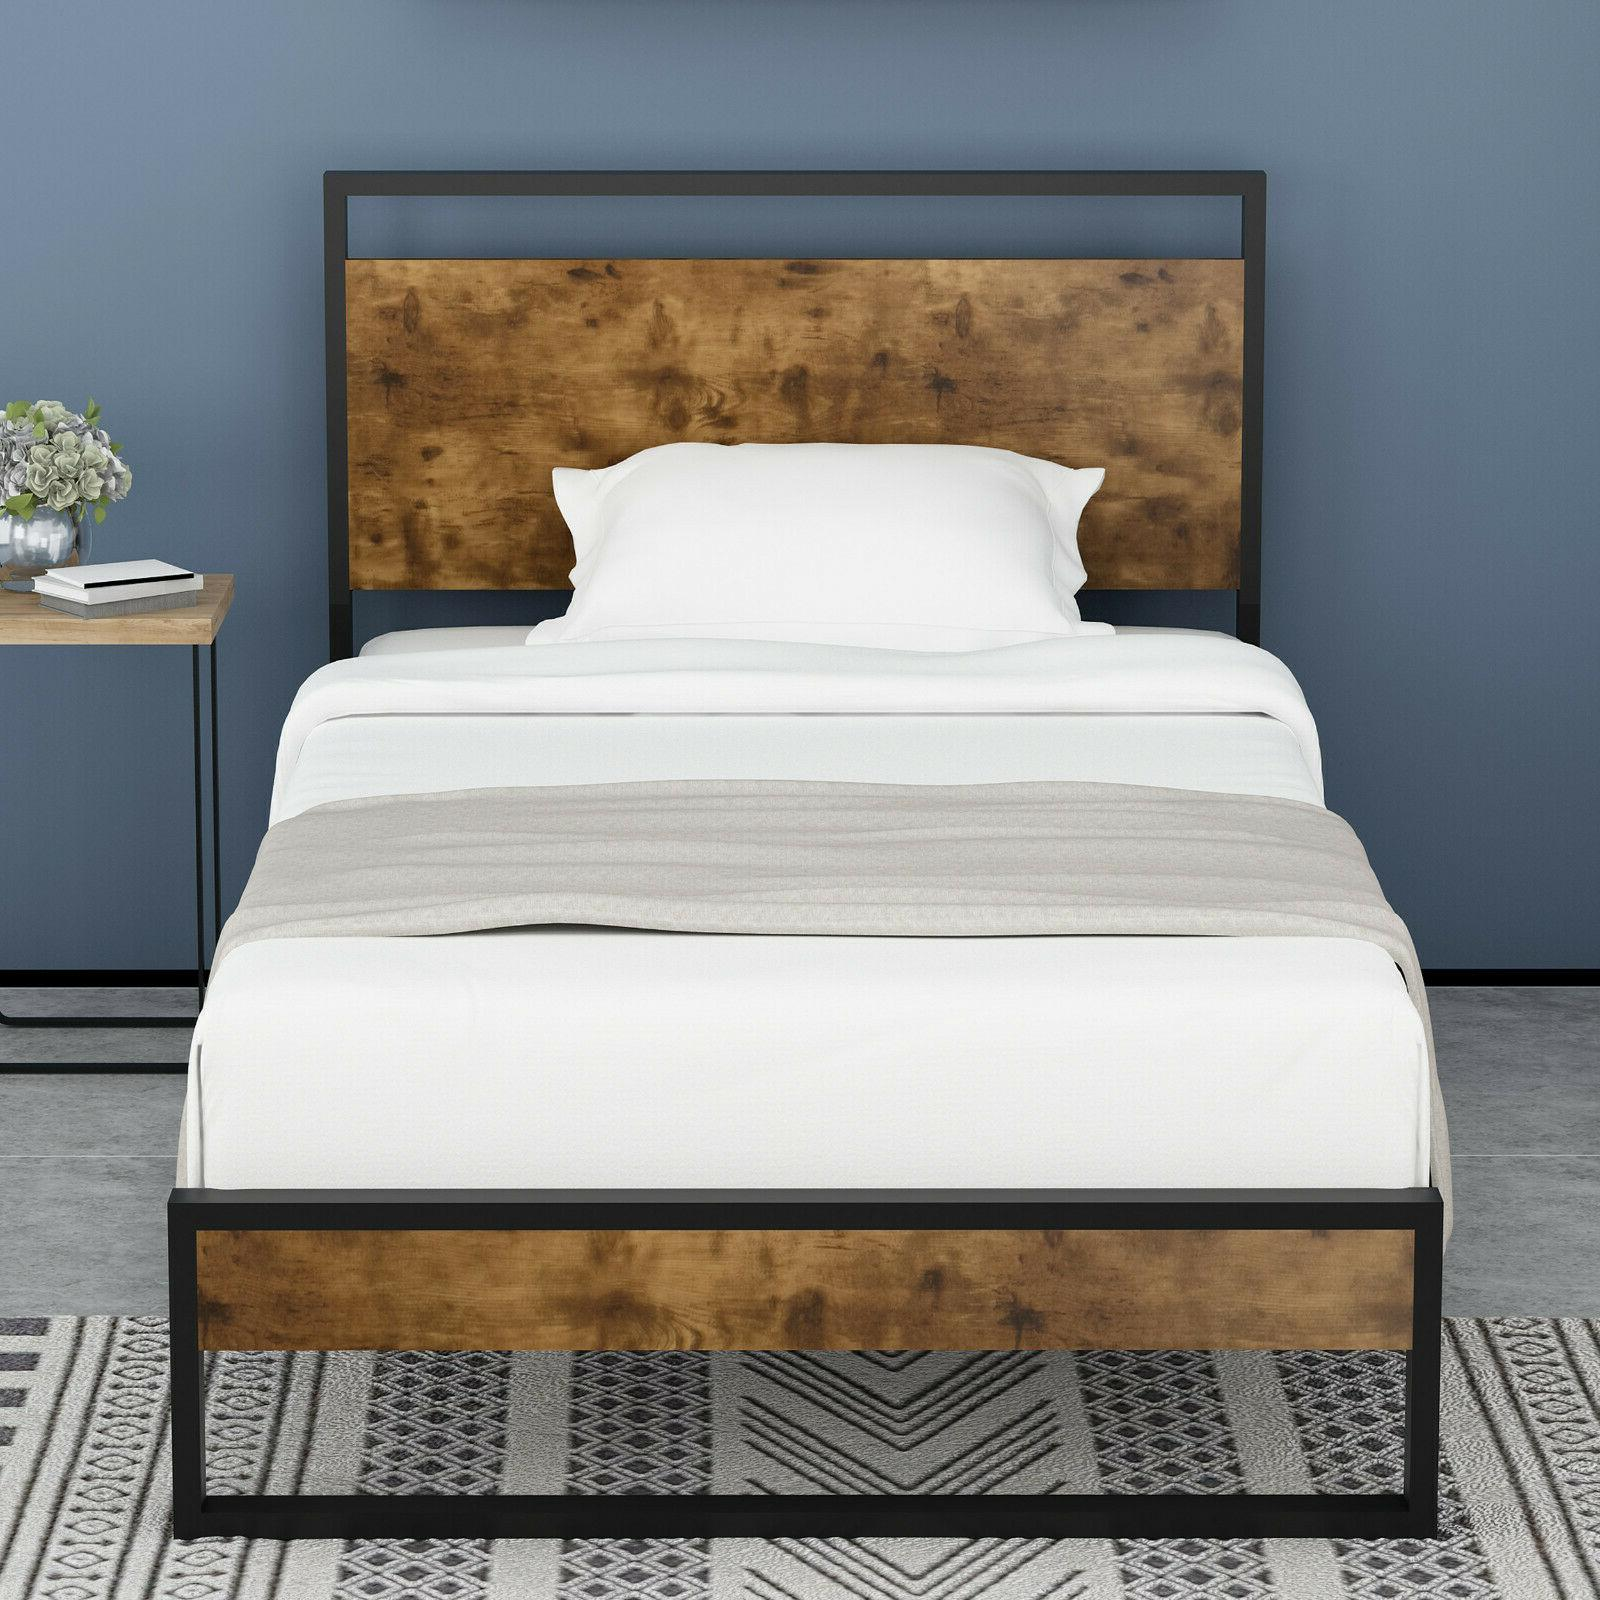 Wood Headboard, High and